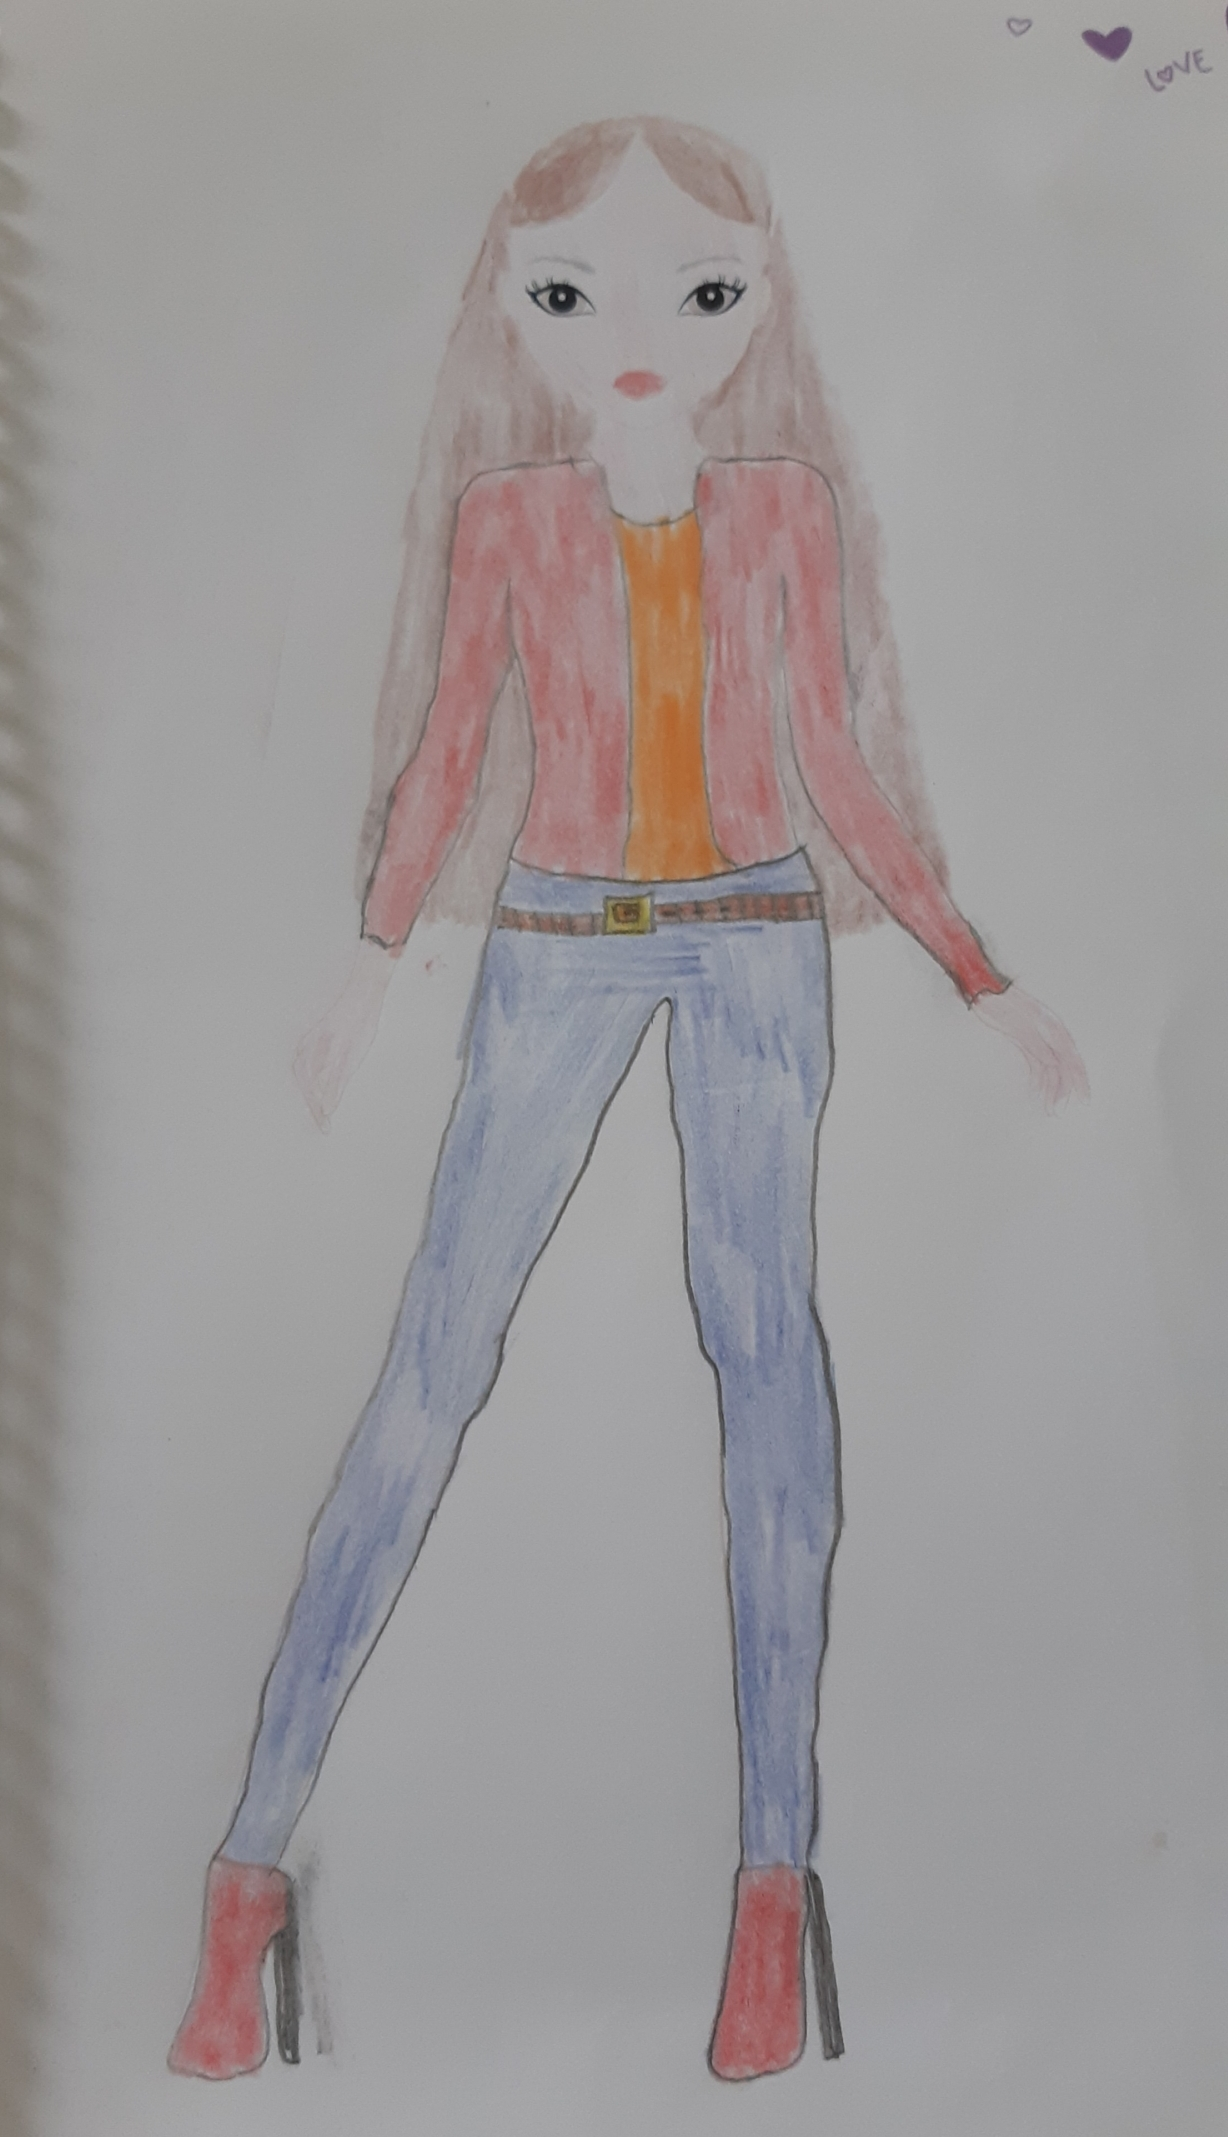 Violetta F., 9 años, de Cordoba